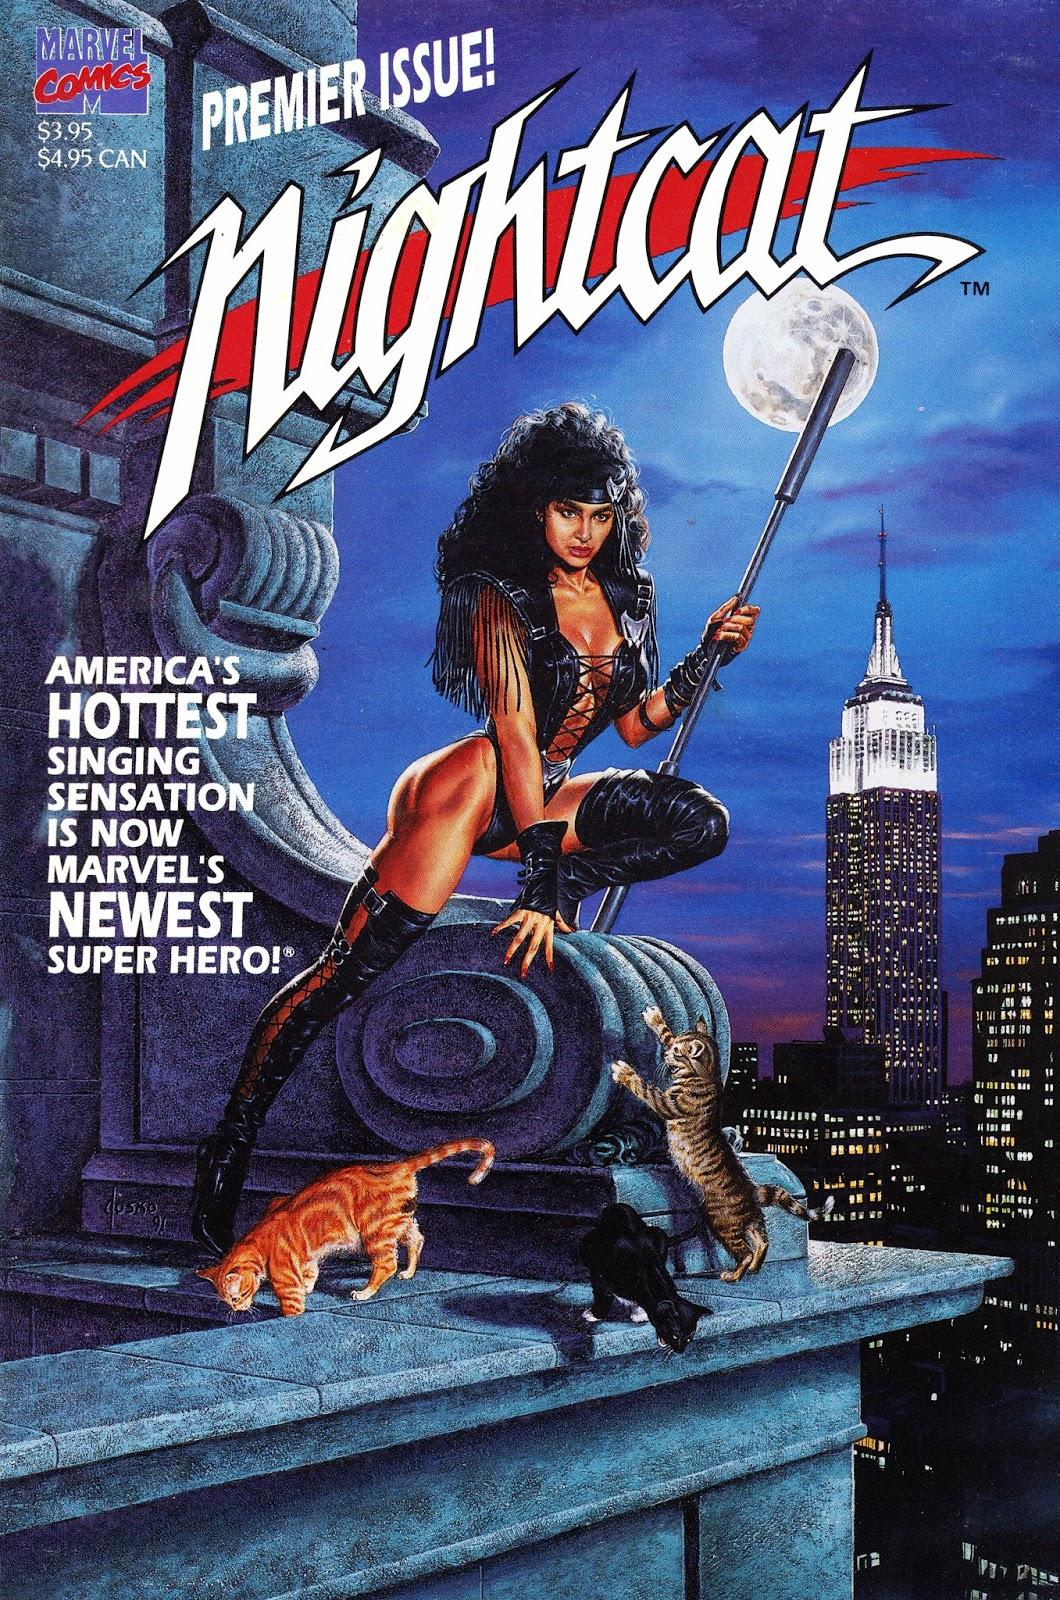 Starlogged Geek Media Again 1991 Nightcat One Shot